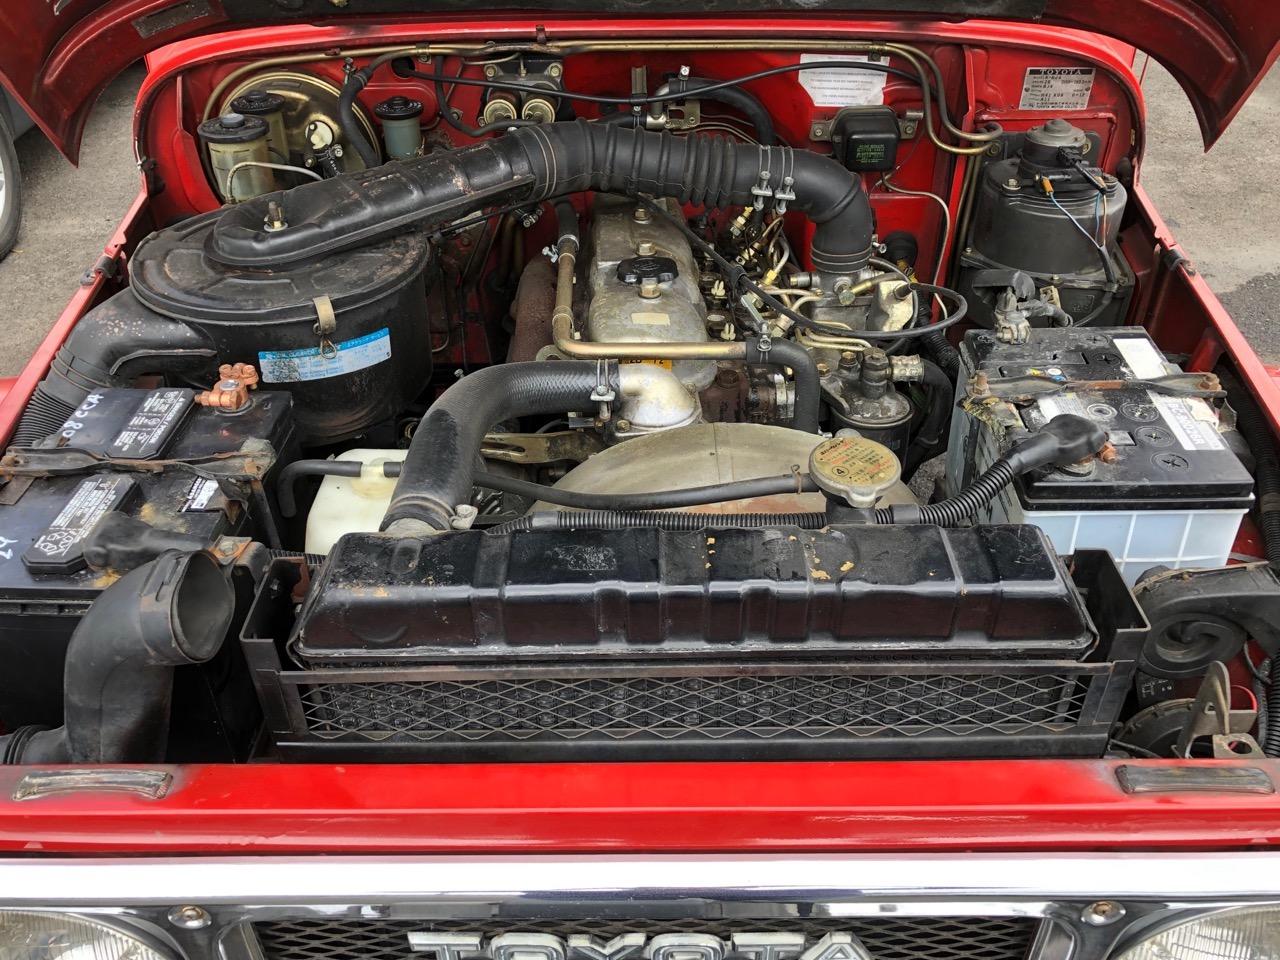 Used 1980 Toyota Land Cruiser BJ40 4WD RHD